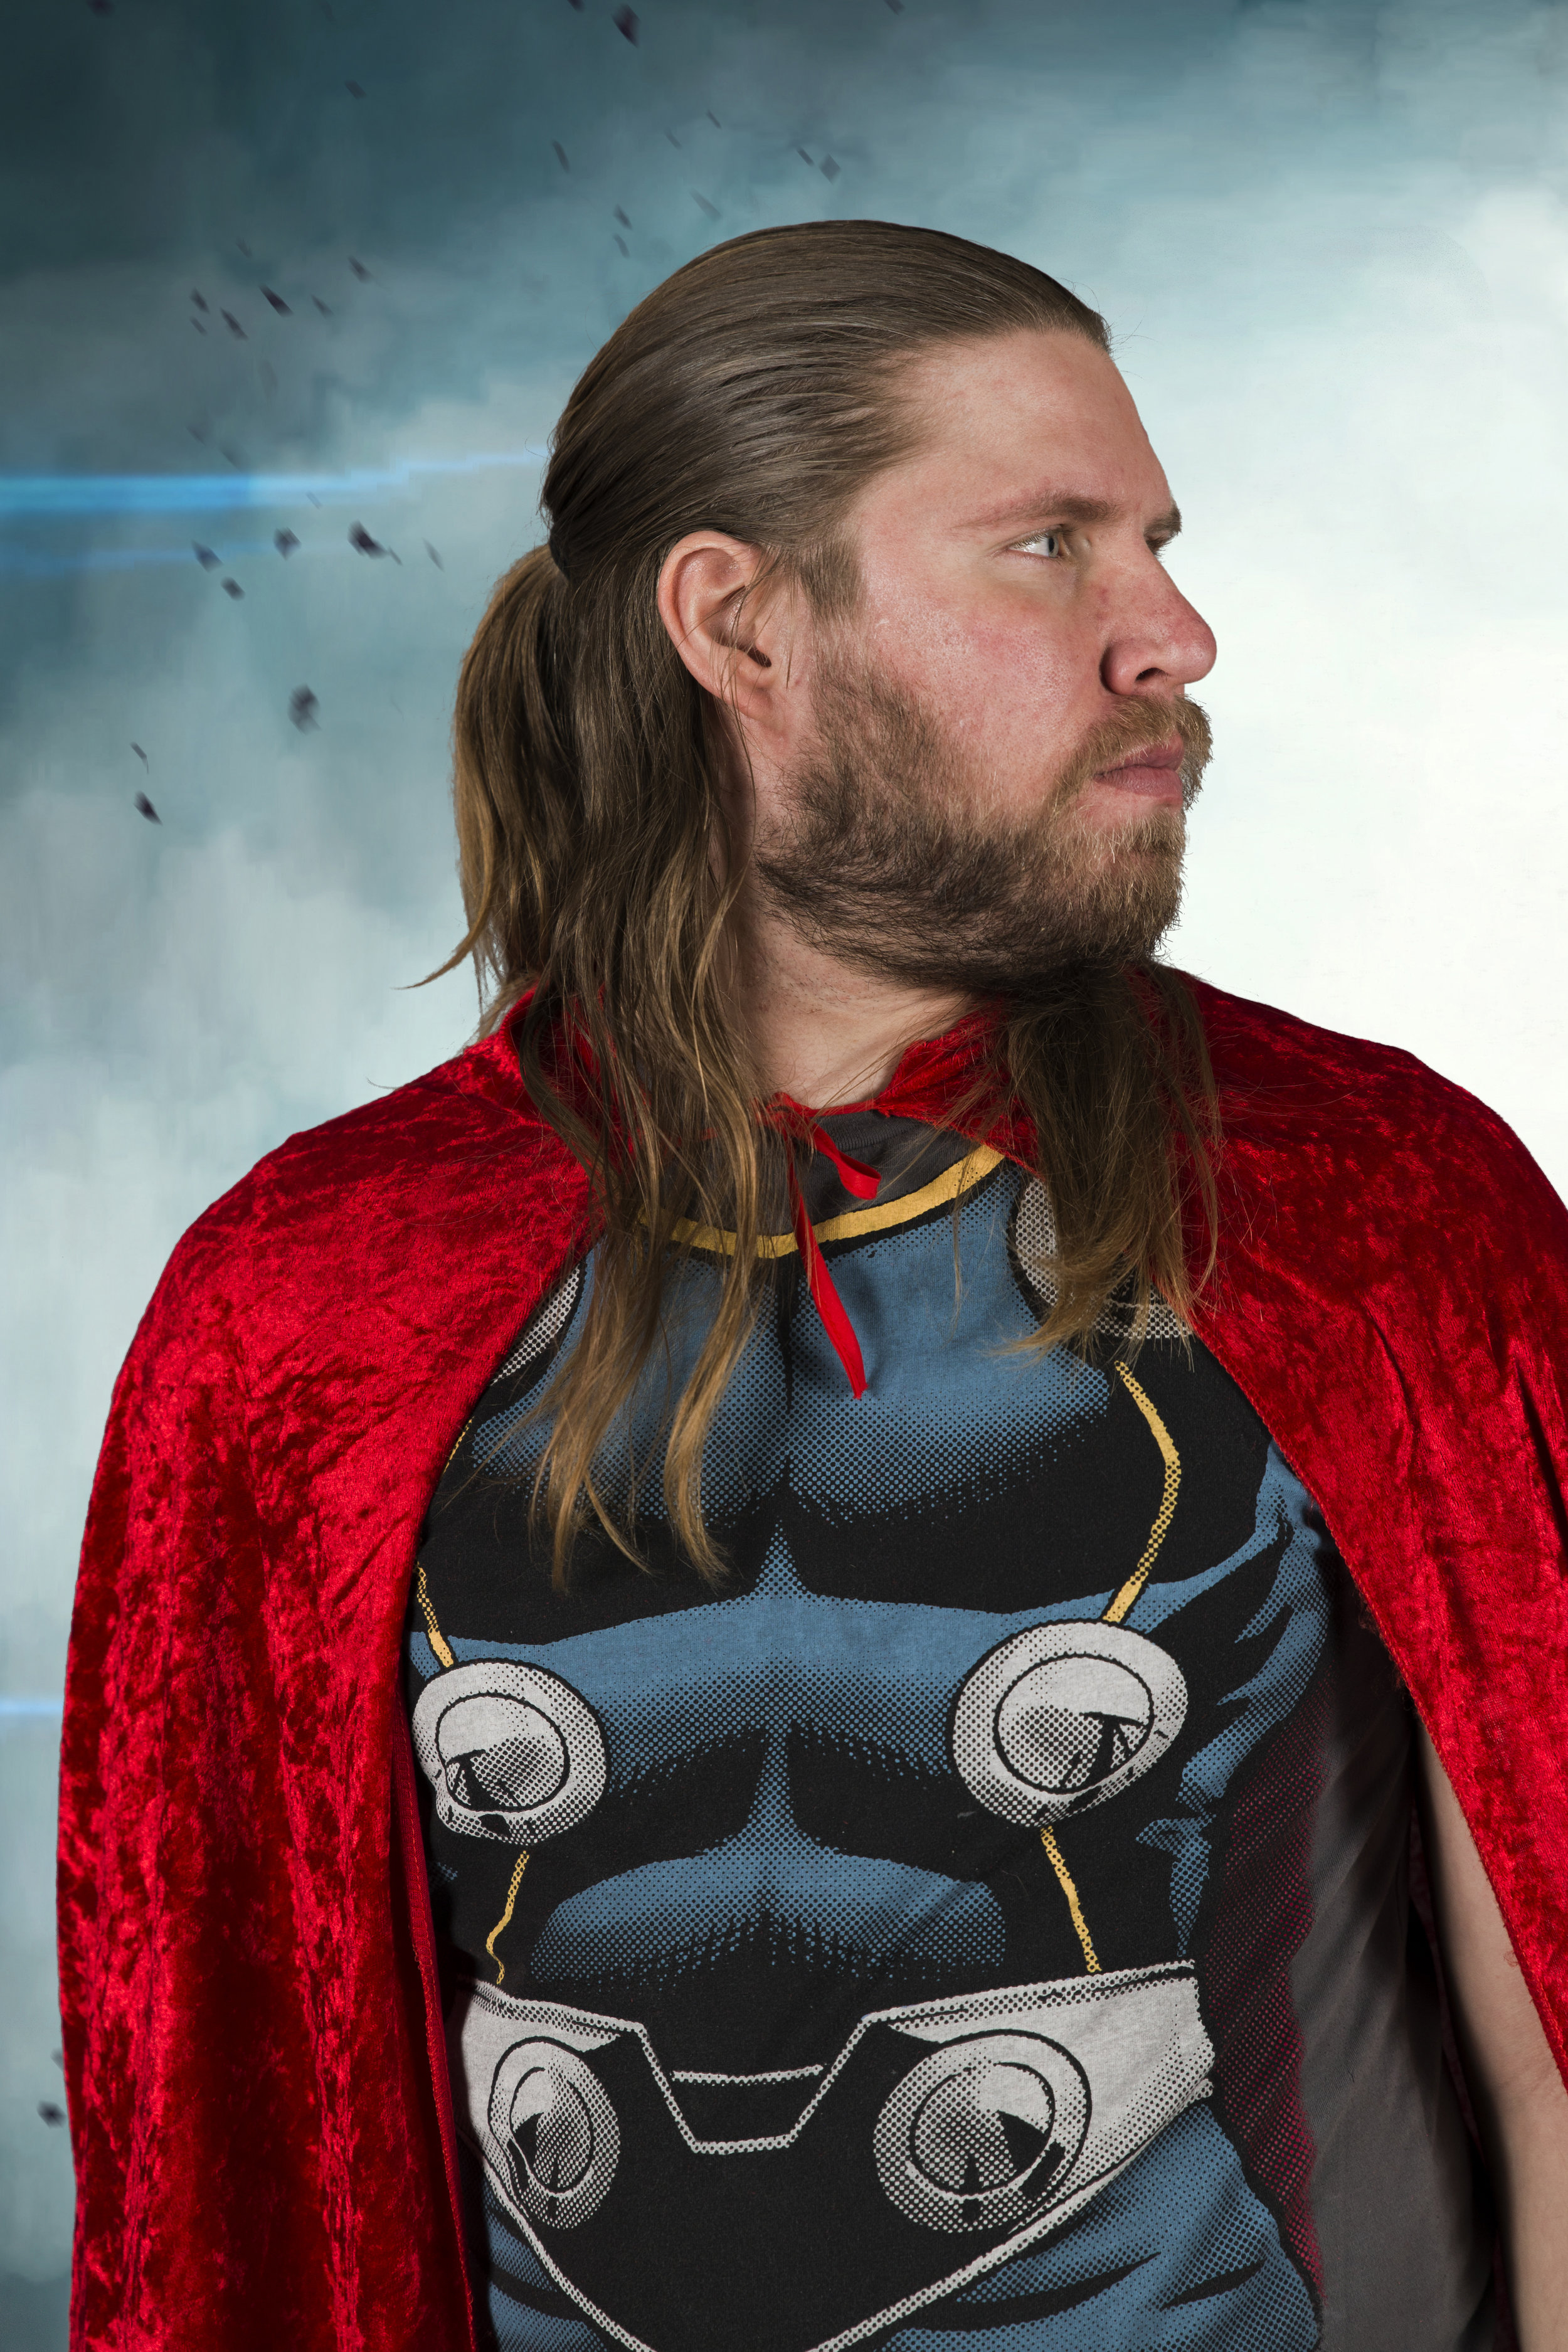 Thor-portrait-session6.jpg